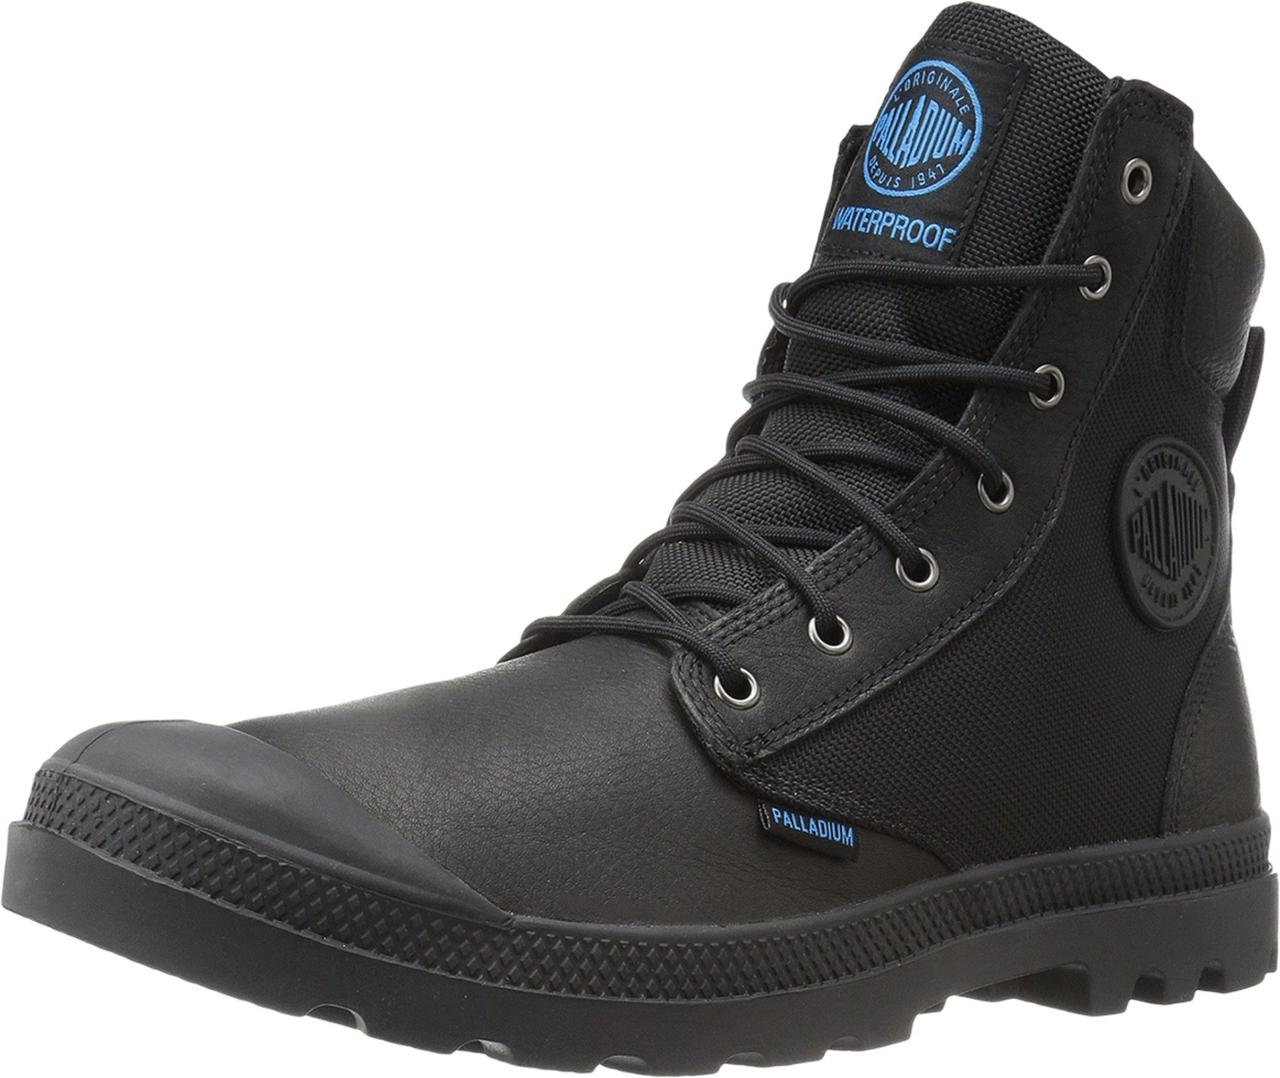 Ботинки Сапоги (Оригинал) Palladium Pampa Sport Cuff WPN Black ... 0df64cbedfb43